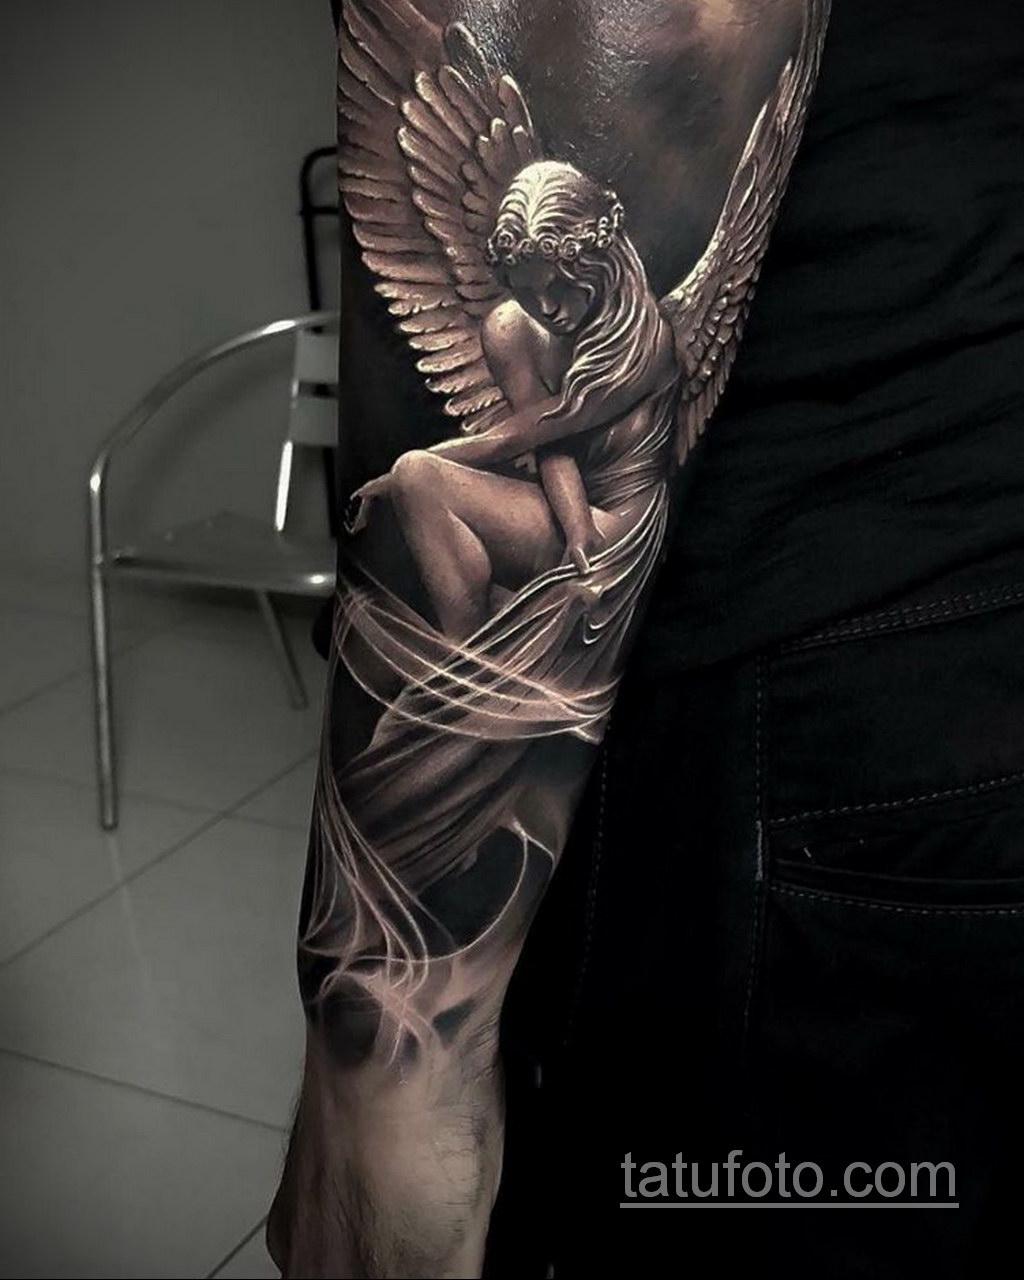 Фото ангел тату на предплечье 25.10.2020 №001 -forearm tattoo- tatufoto.com